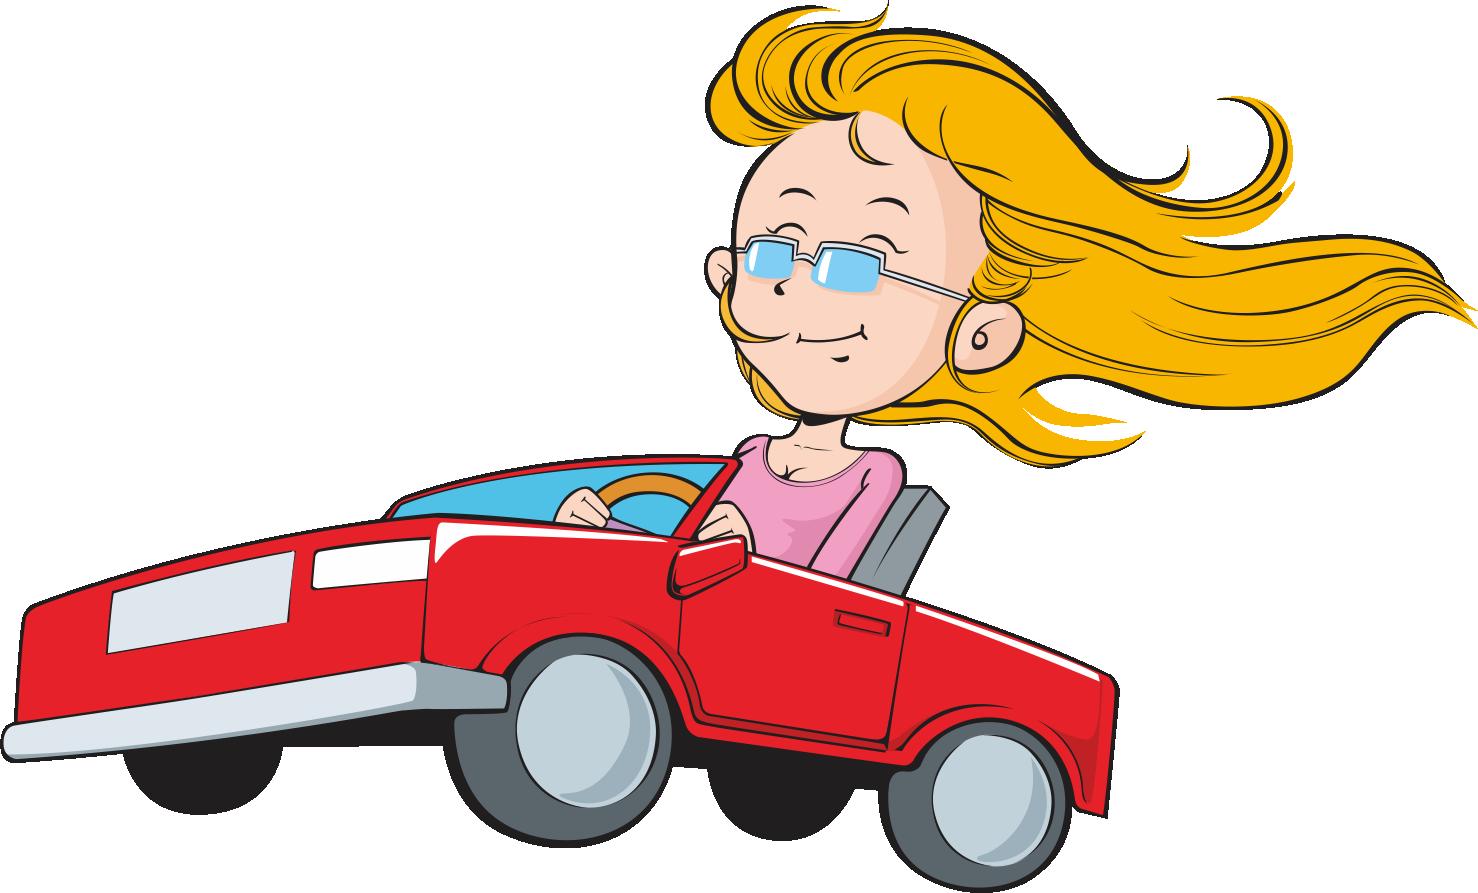 Car driving transprent png. Clipart woman truck driver